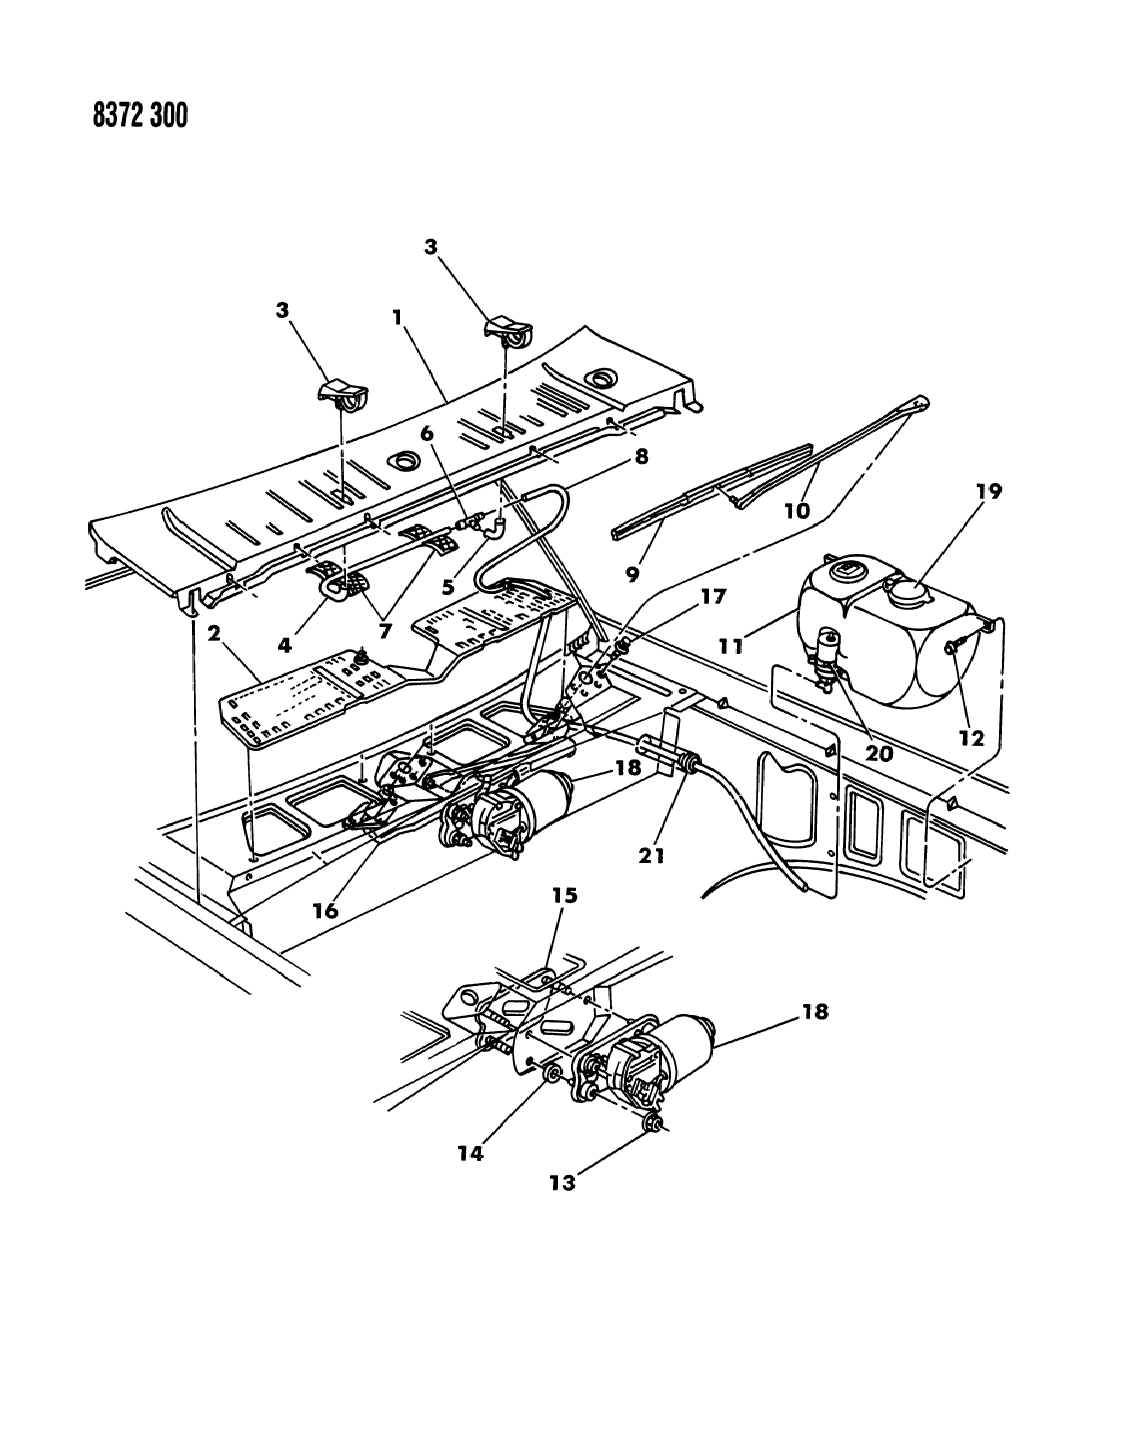 1988 Dodge Dakota Windshield Wiper & Washer System